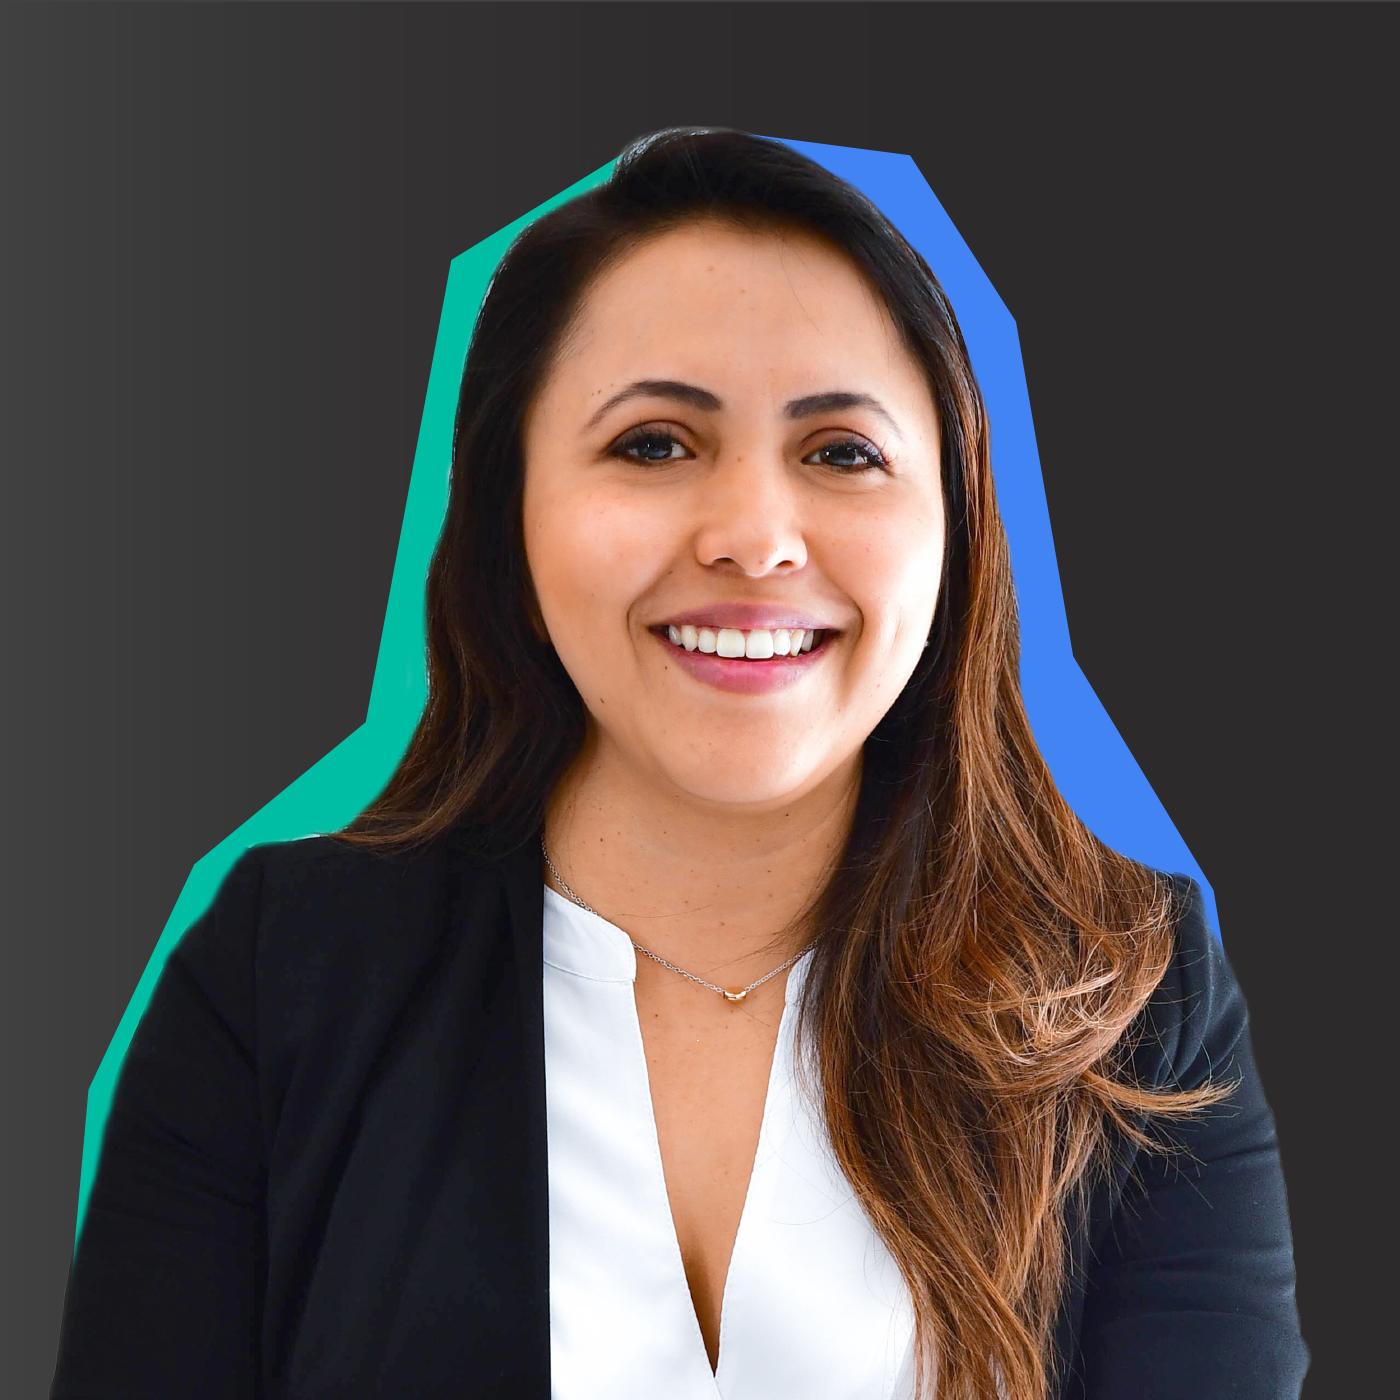 Cristina De La Peña smiling